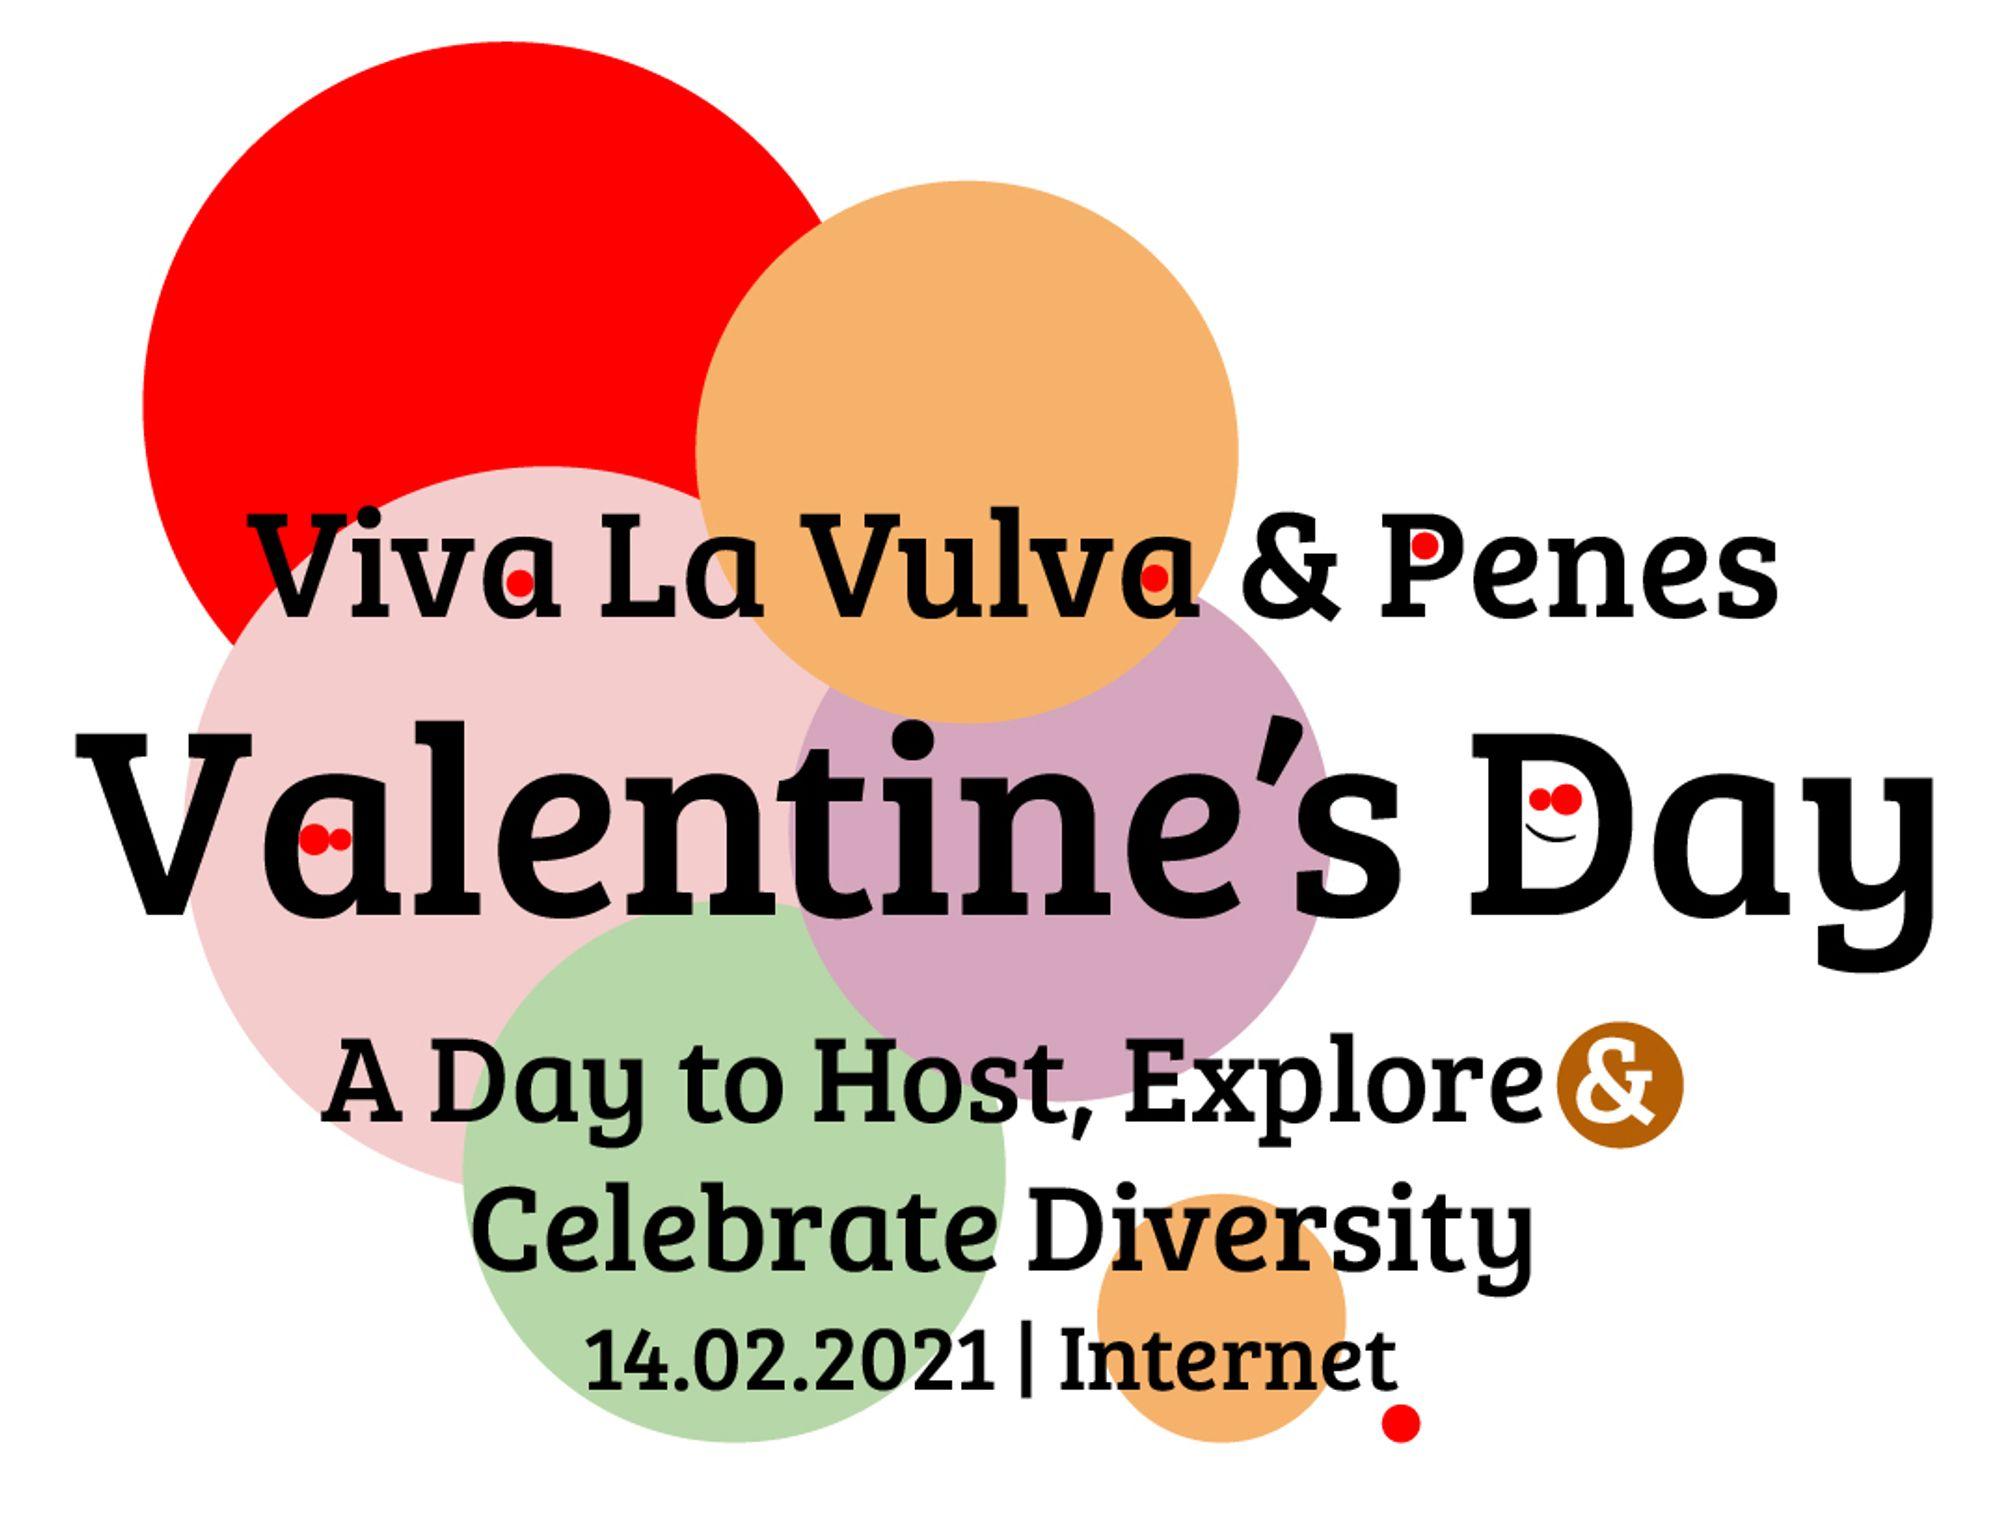 Viva La Vulva & Penes Valentine's Day